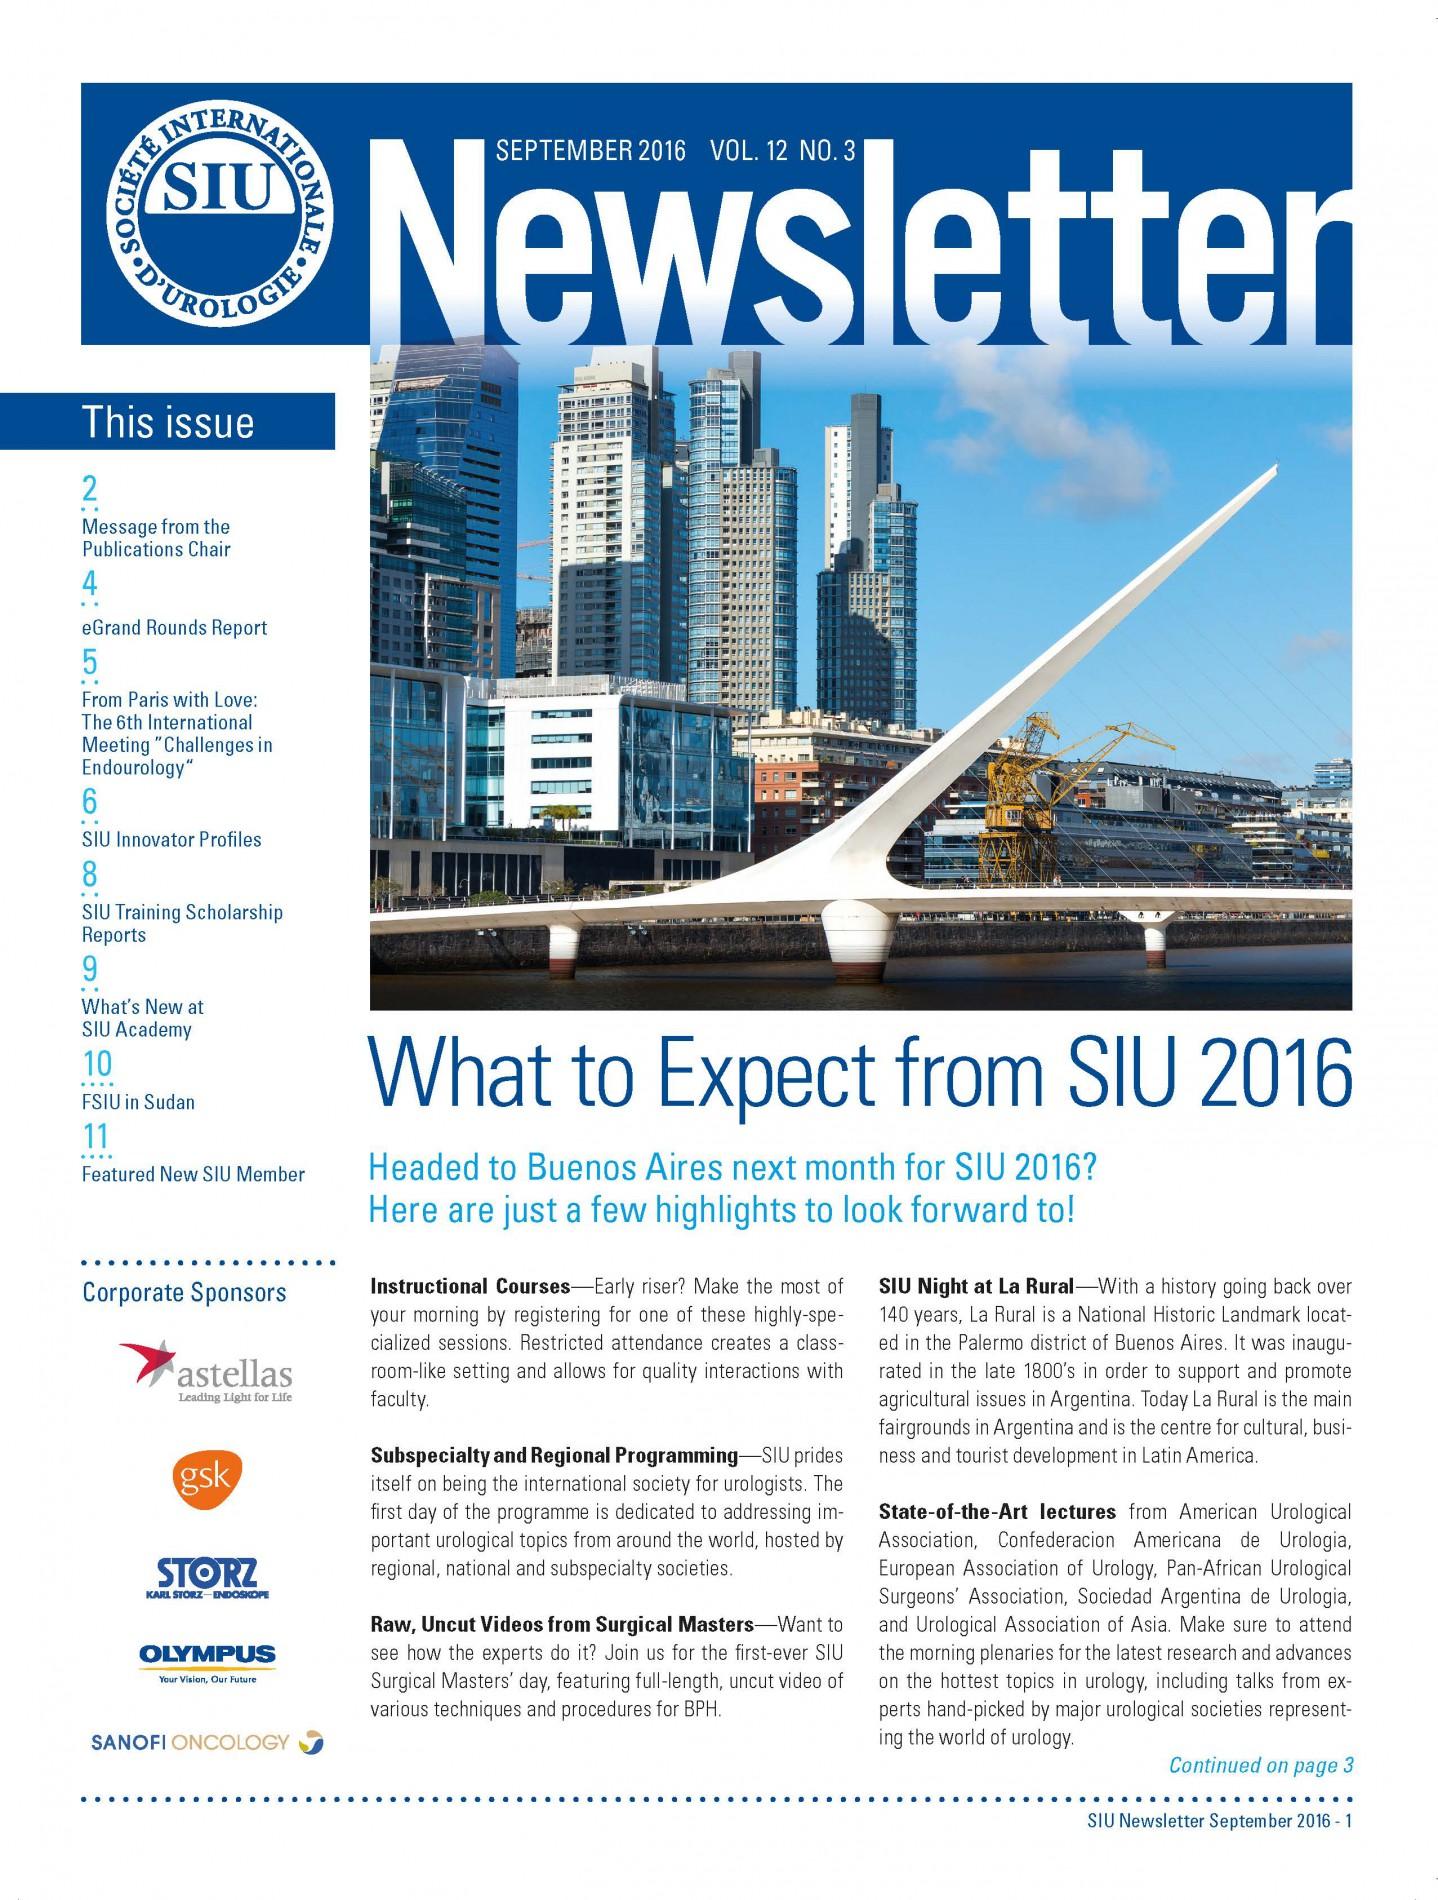 Vol. 12 N0. 3<br />September 2016